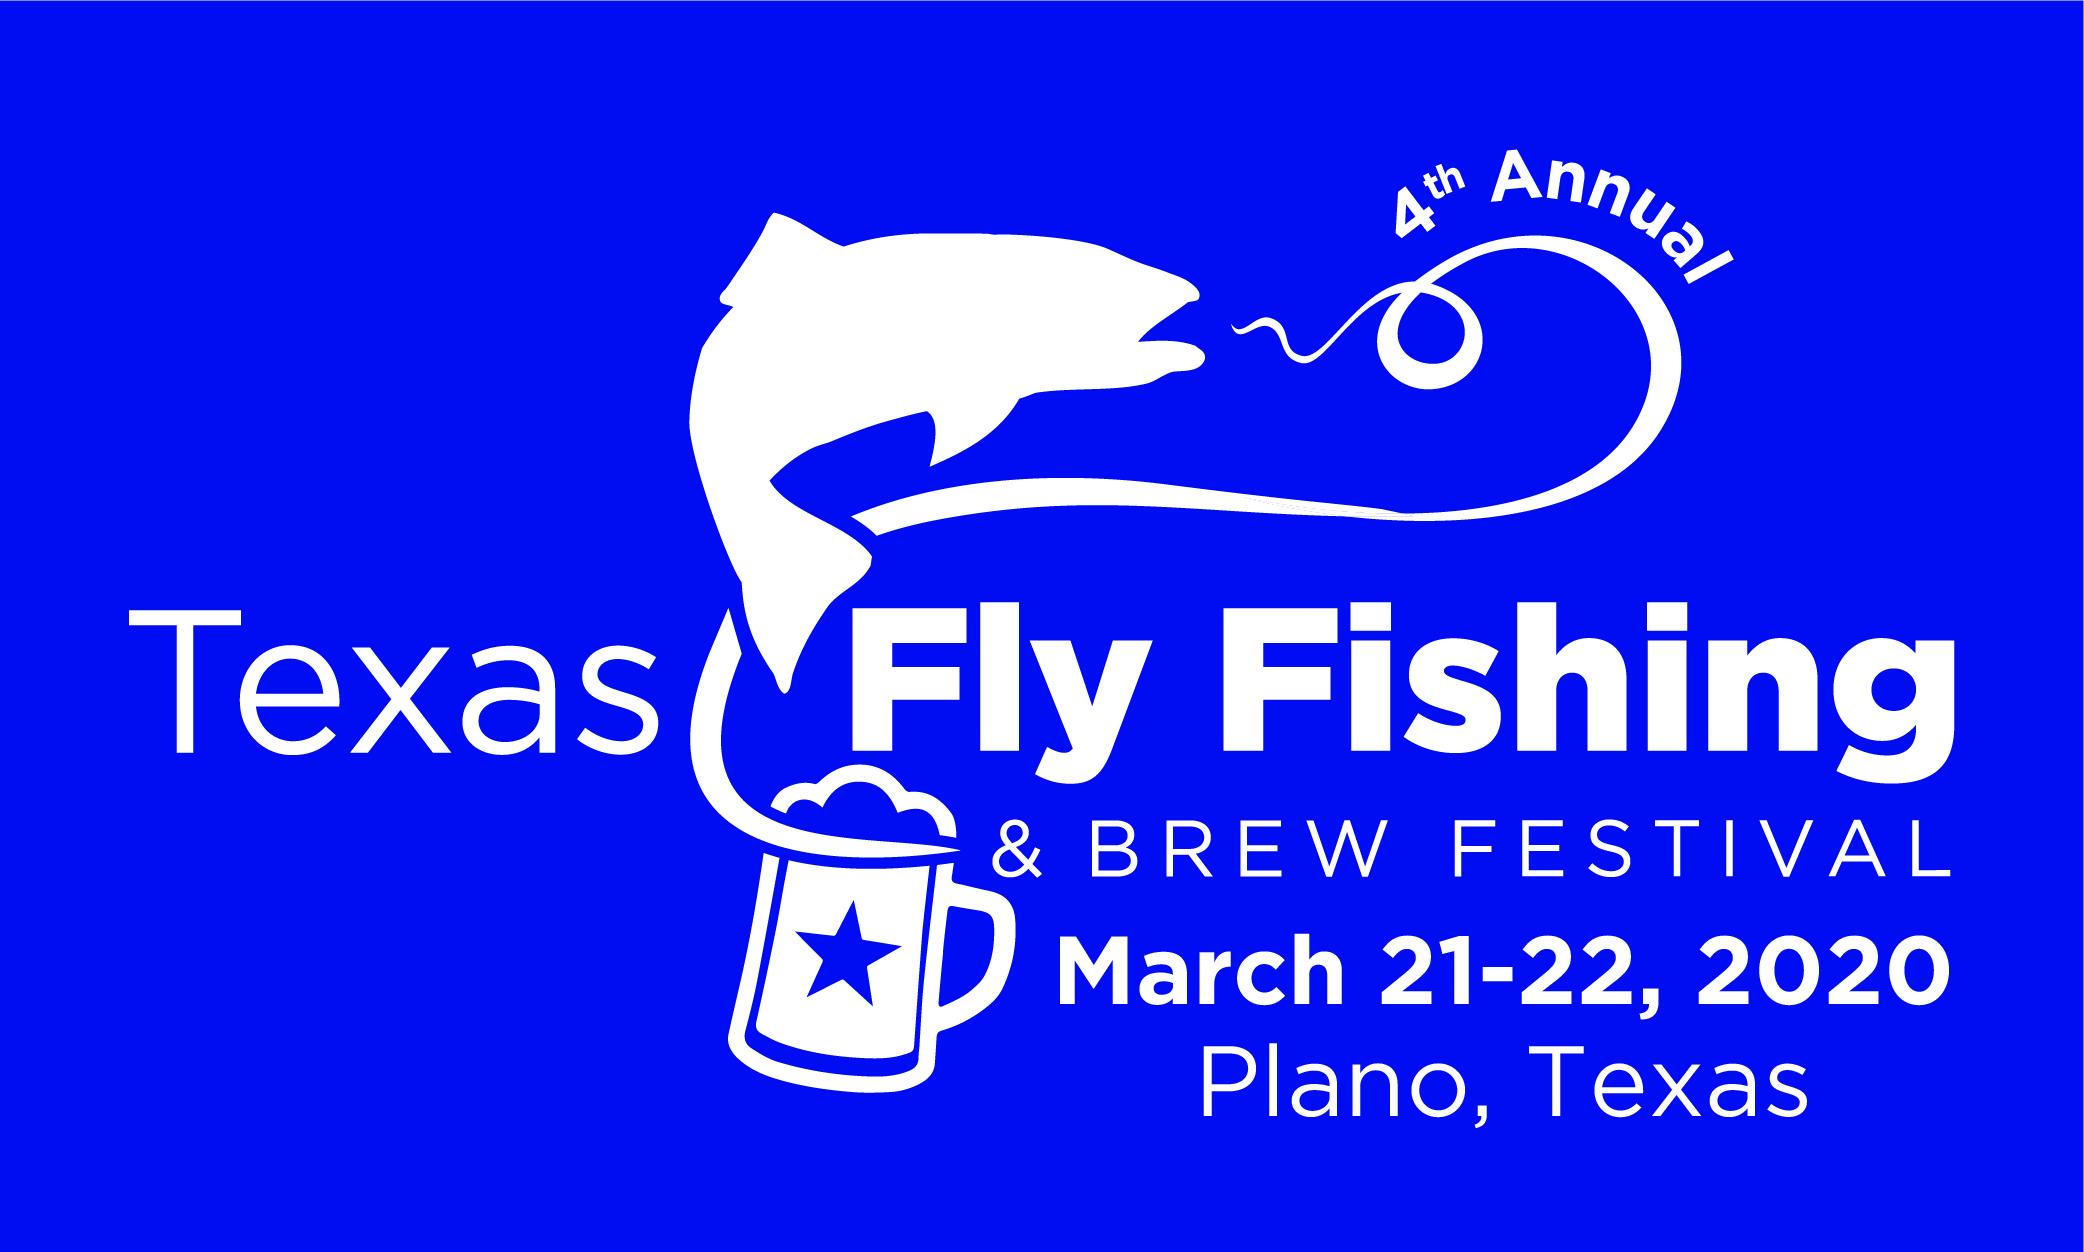 Texas Fly Fishing & Brew Festival